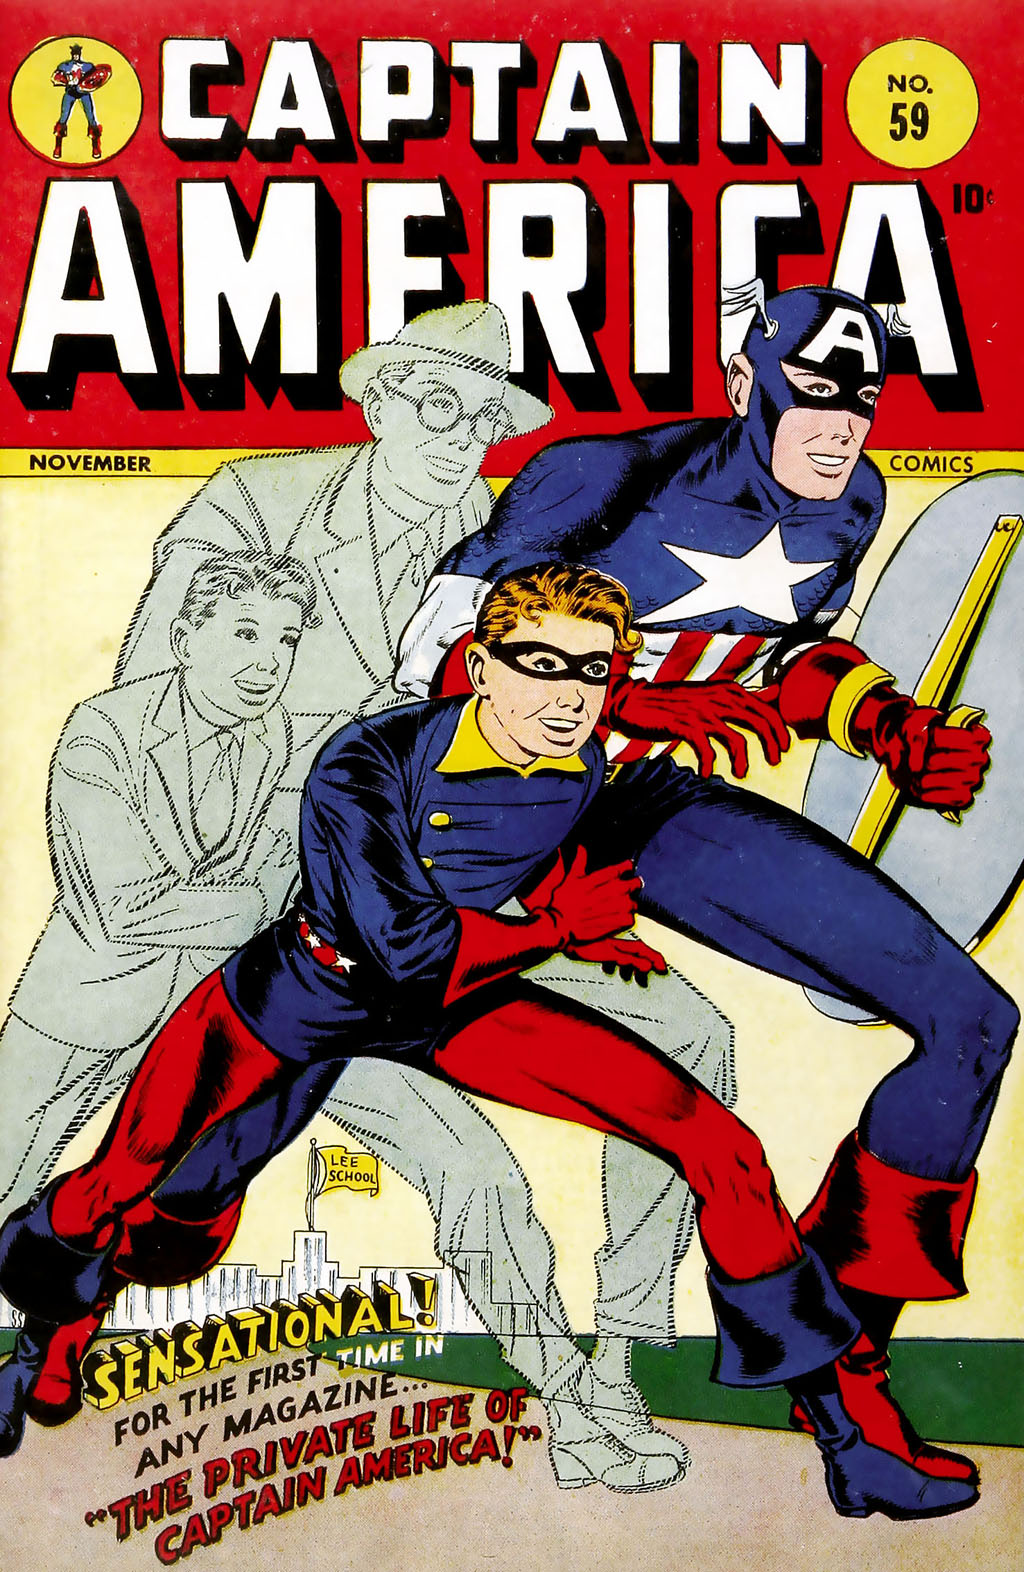 Captain America Comics 59 Page 1